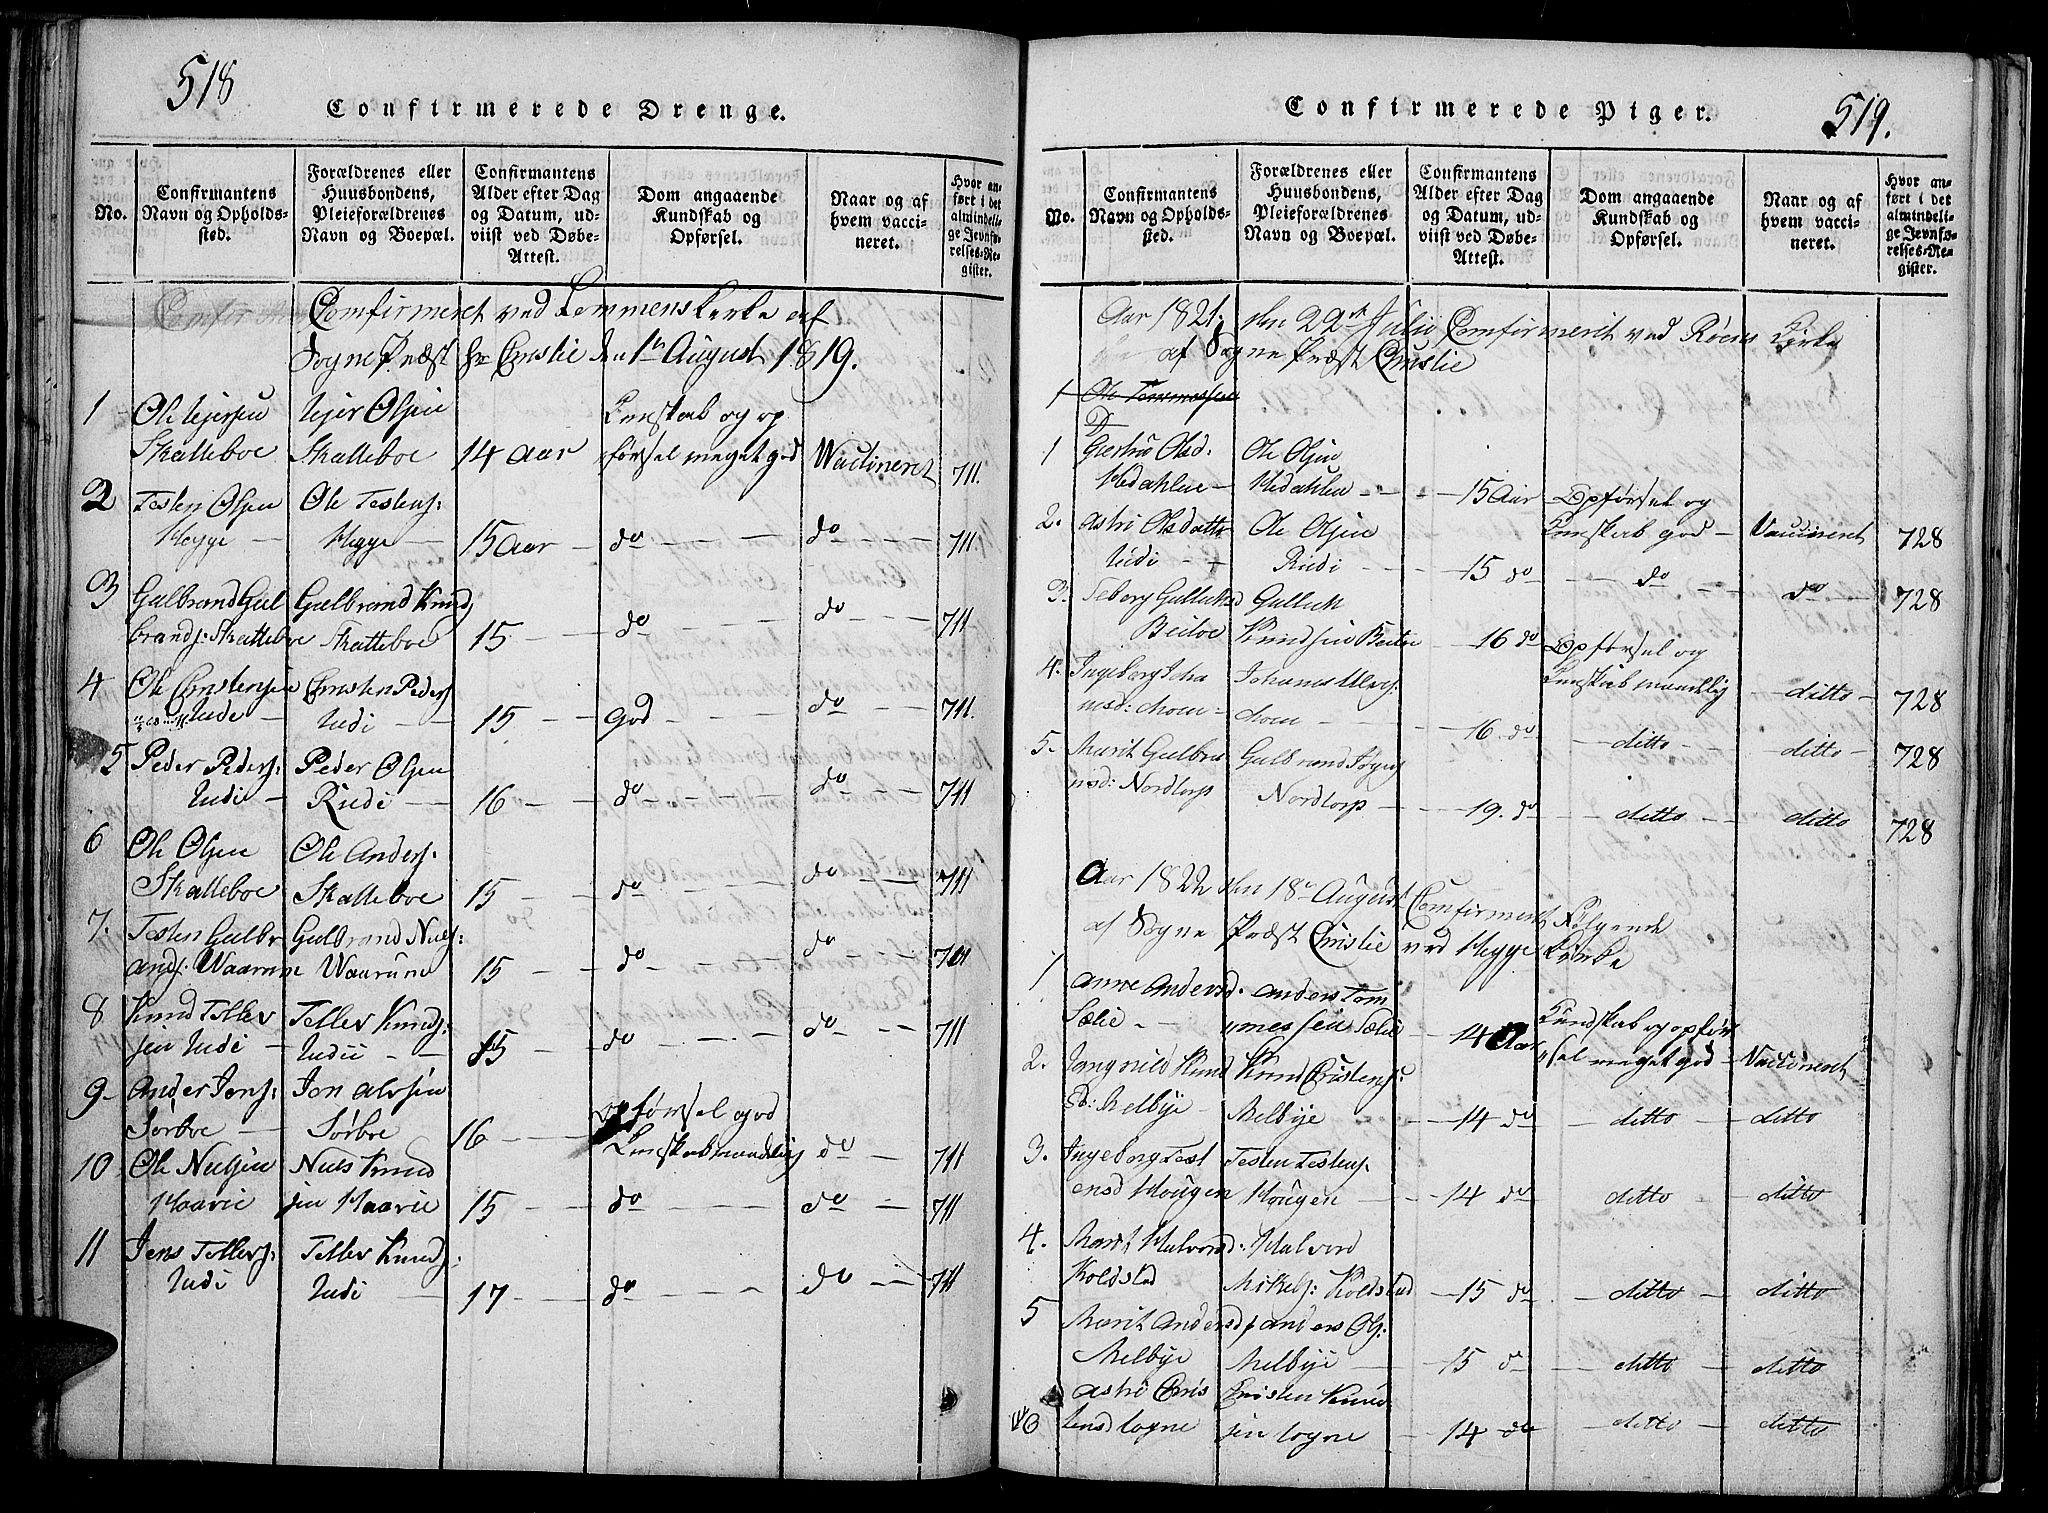 SAH, Slidre prestekontor, Klokkerbok nr. 2, 1814-1839, s. 518-519